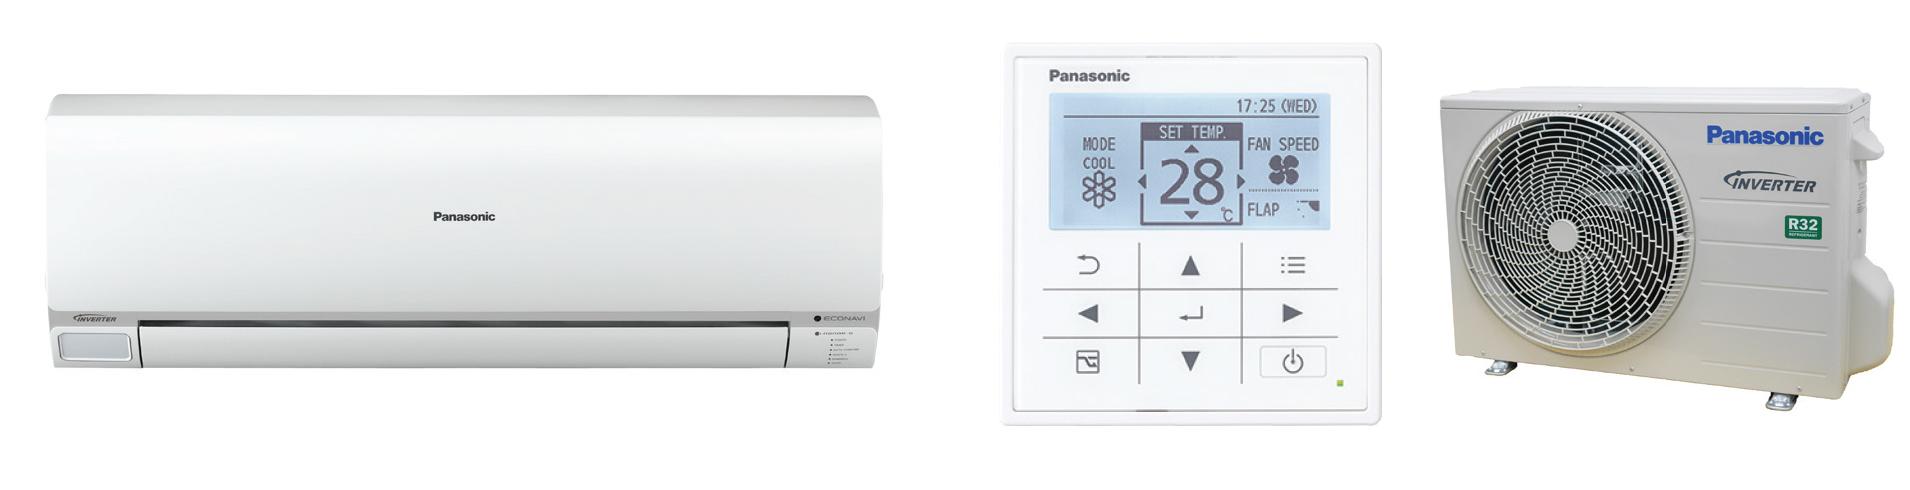 Panasonic Air Conditioning Split System